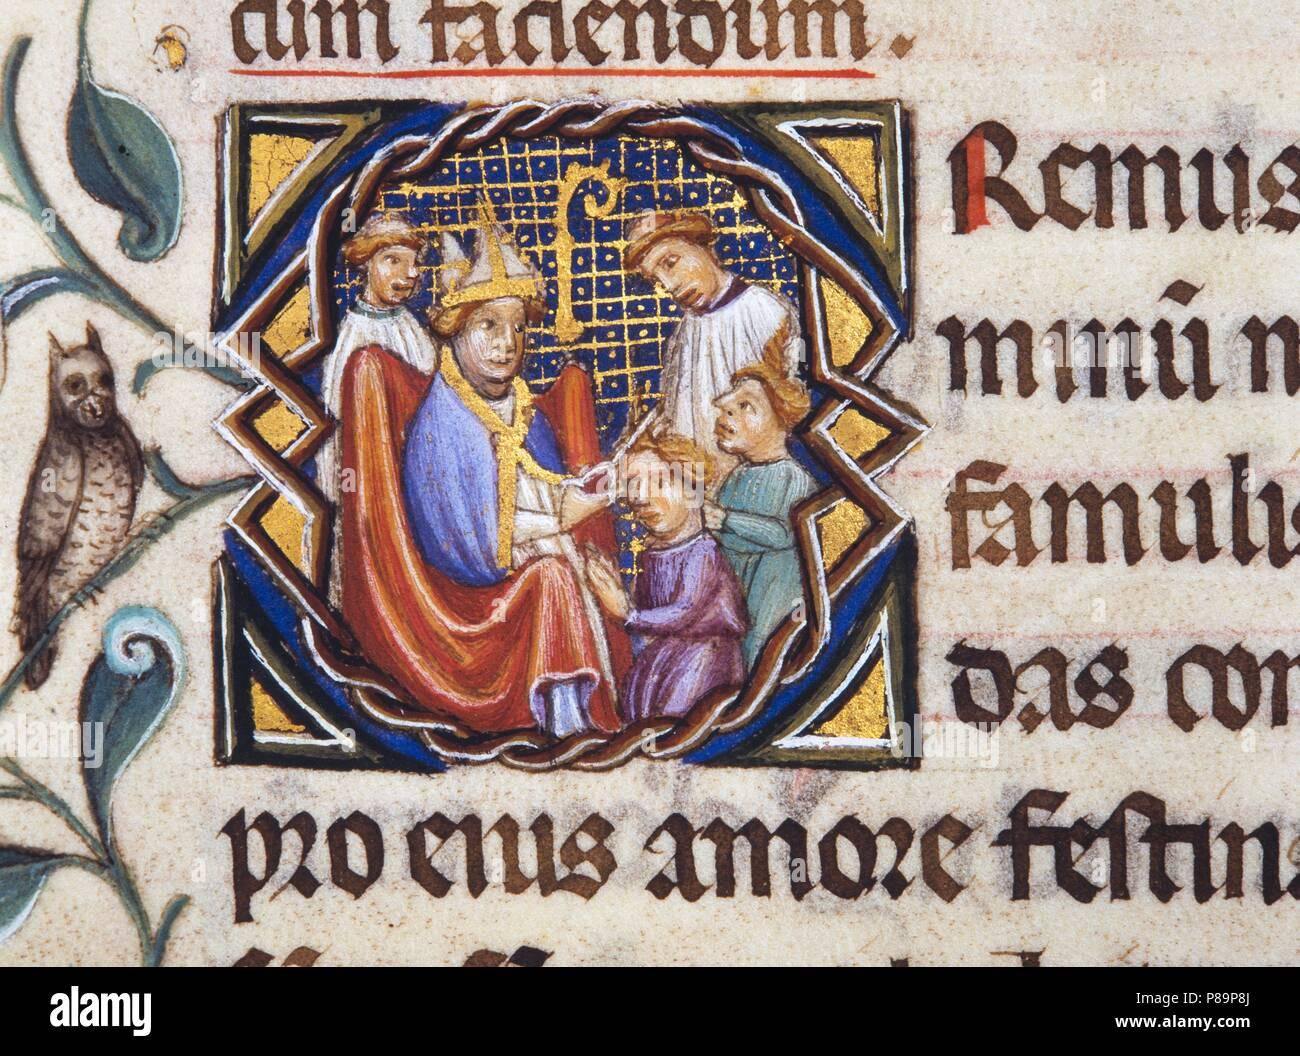 Pontificia de Guillaume Durand, c. 1409-1415. Letra inicial obispo realizando anu tonsura. Arxiu Capitular de la Catedral de Girona. Foto de stock